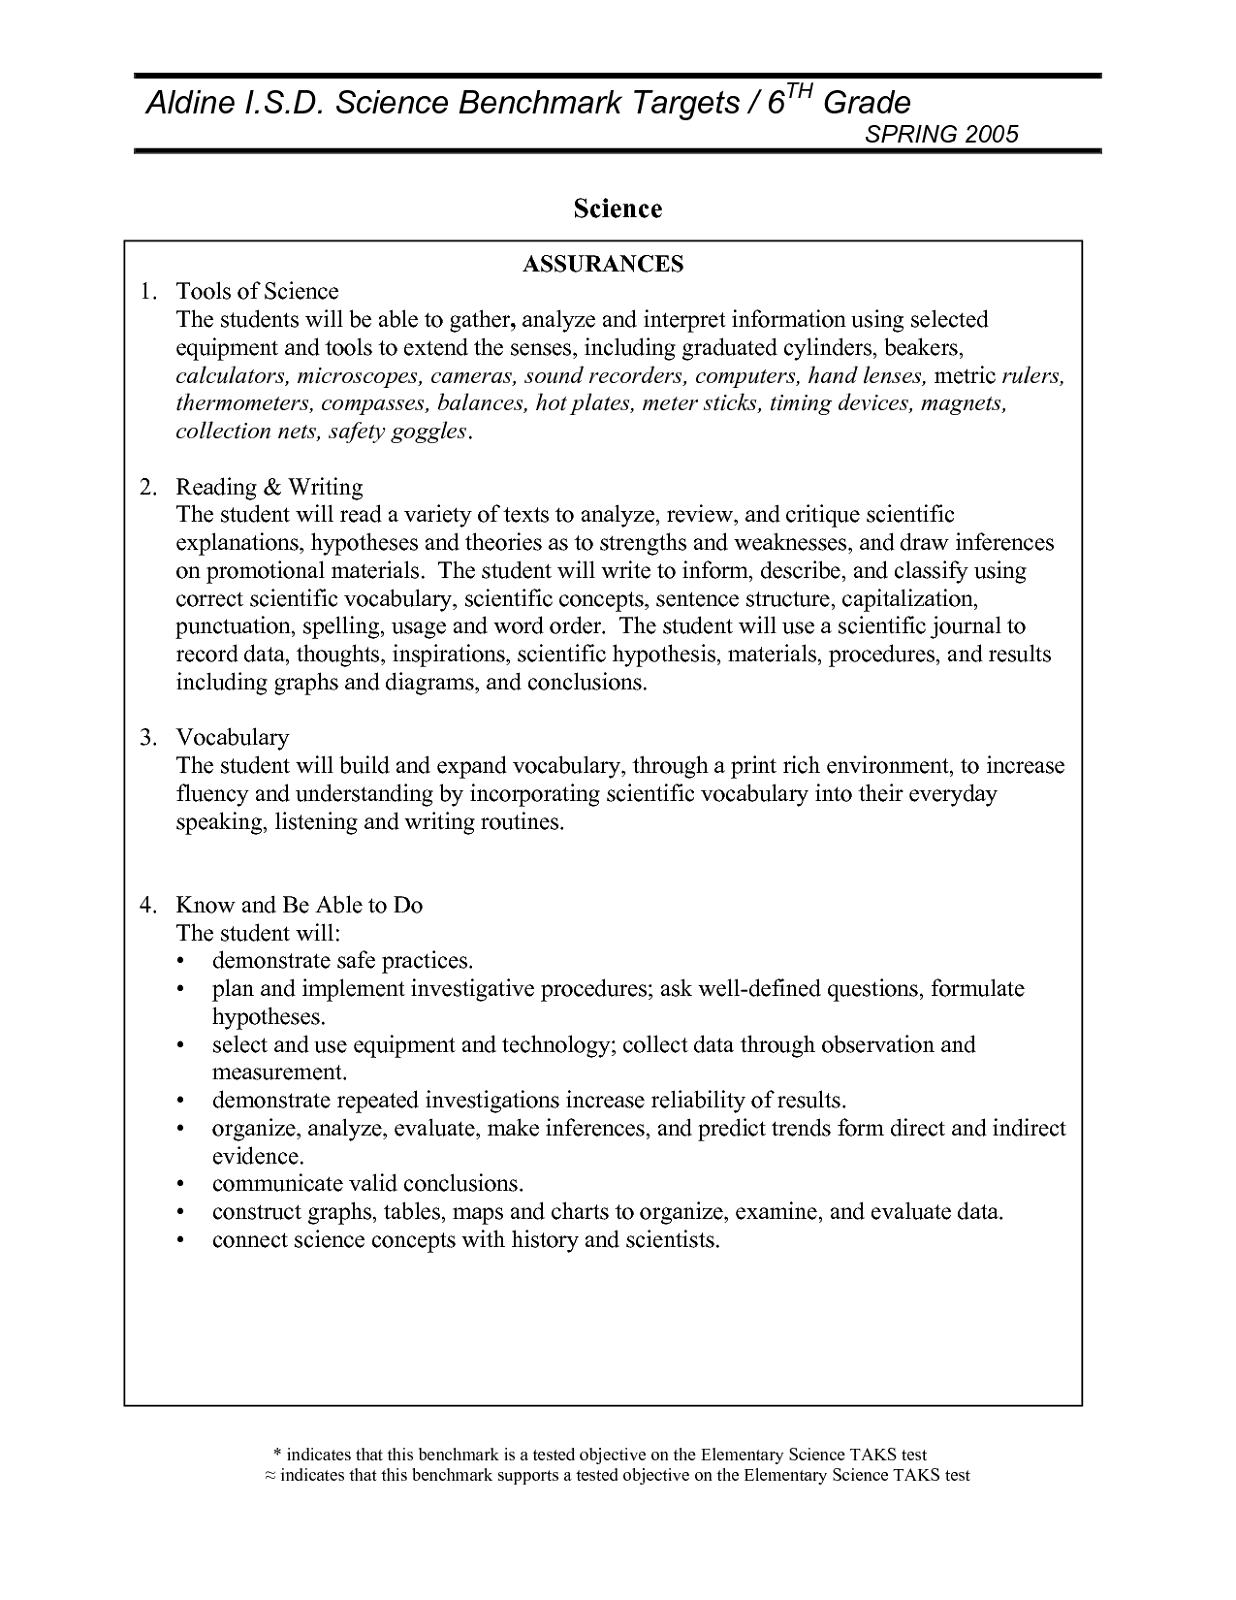 Worksheets 6th Grade Science Worksheets Plantsvszombiesonline Free Worksheets For Kids